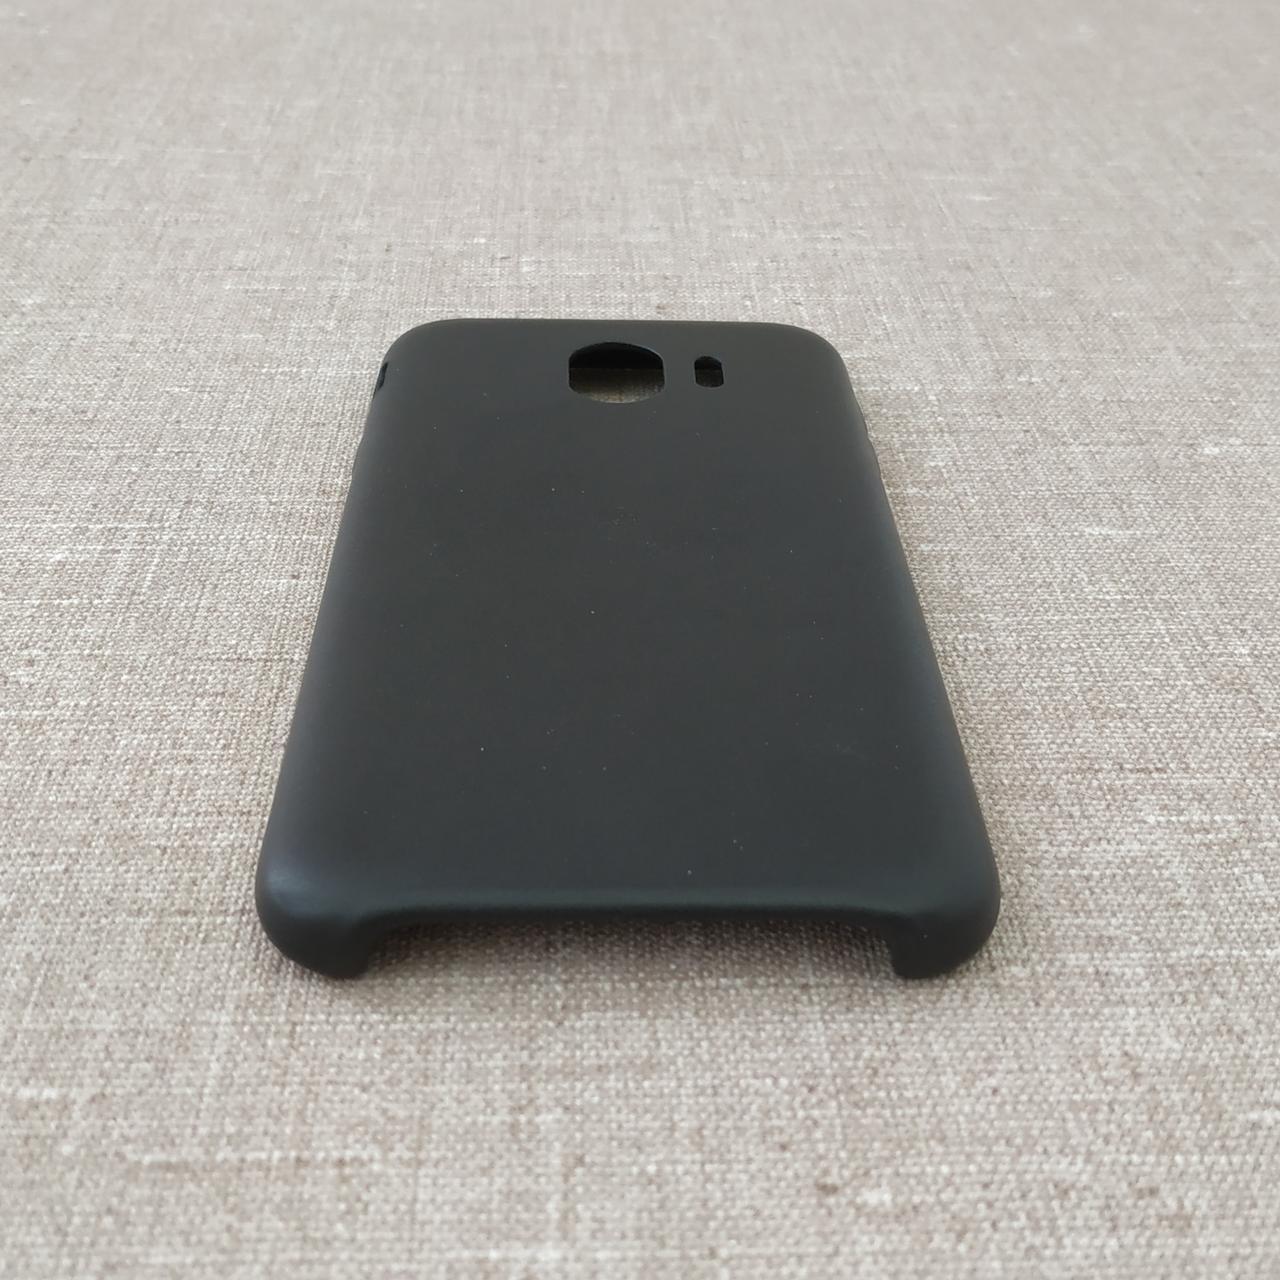 Чехол 2E PU Samsung Galaxy J4 J400 black (J400) 2018